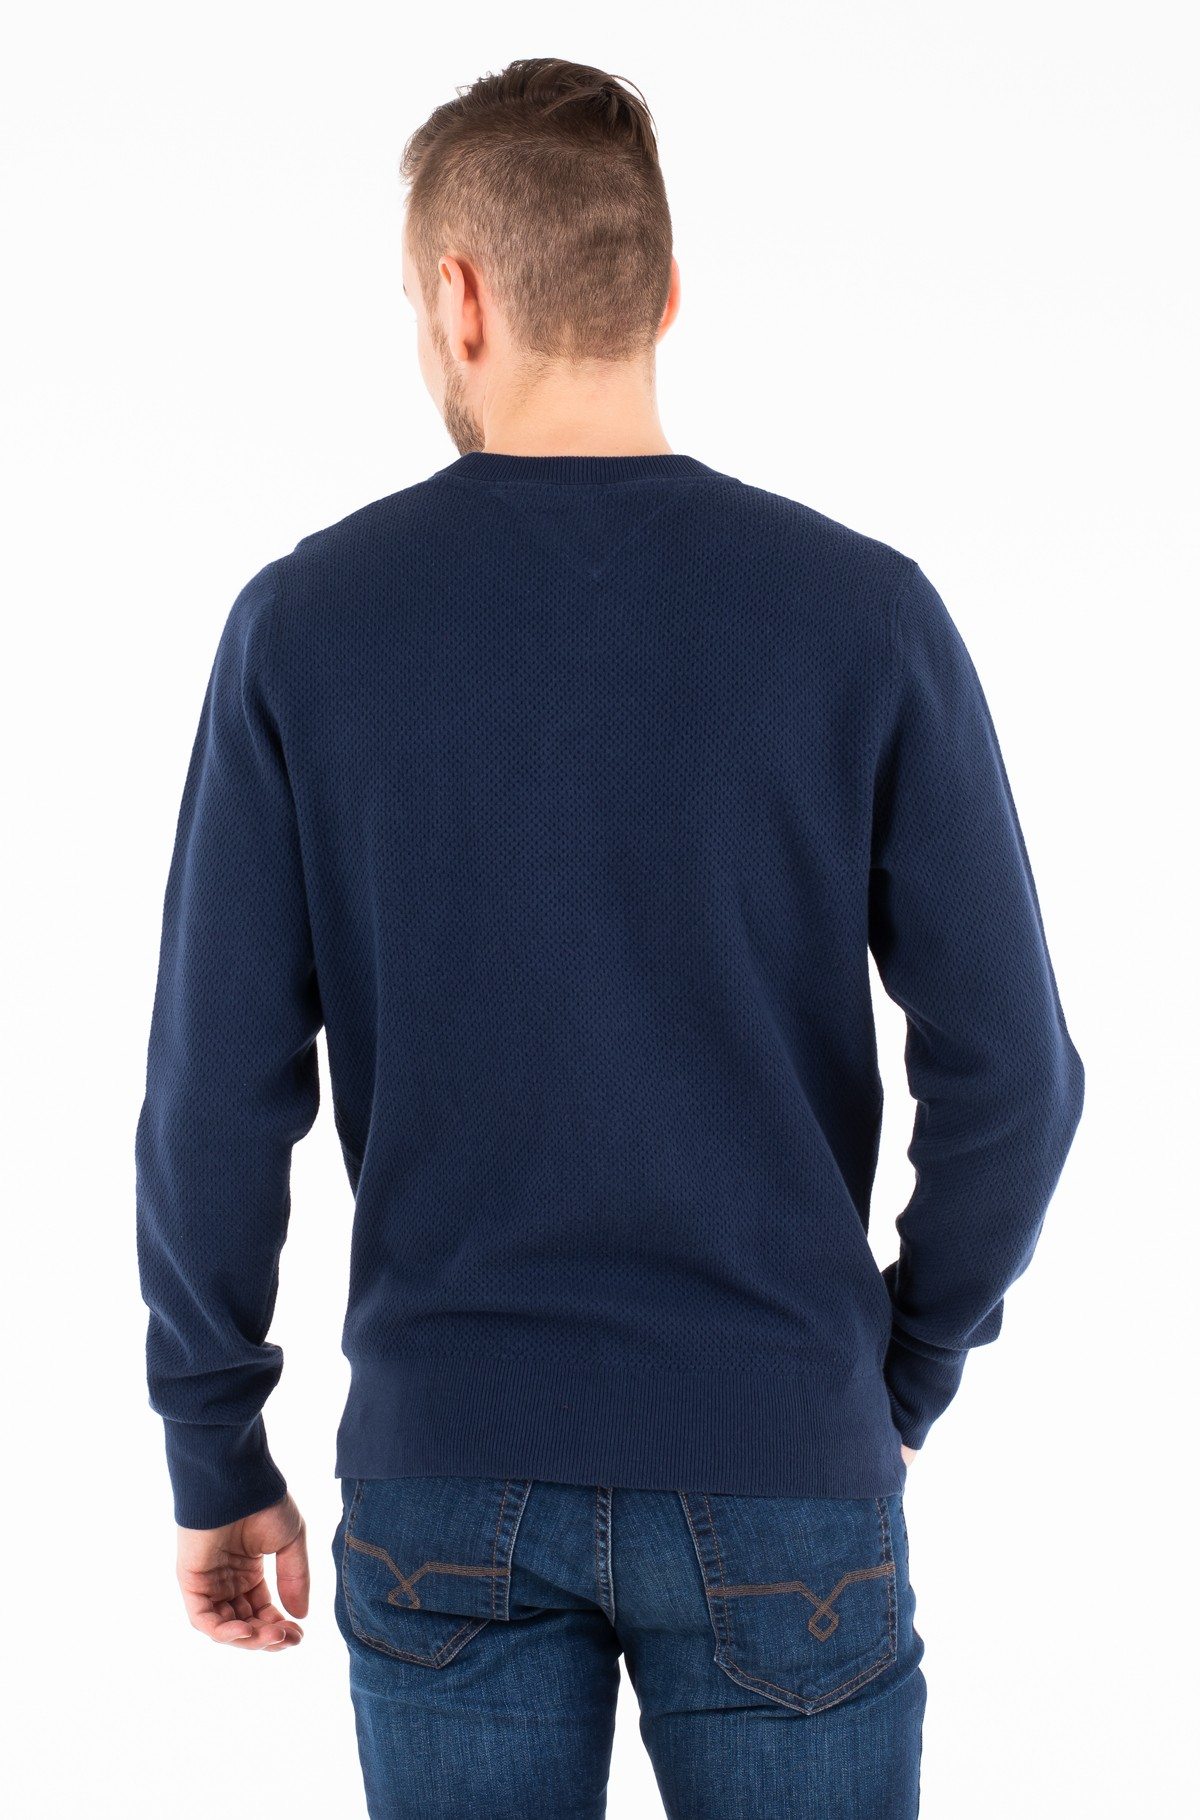 Sweater COTTON MESH STRUCTURED CREW NECK-full-2